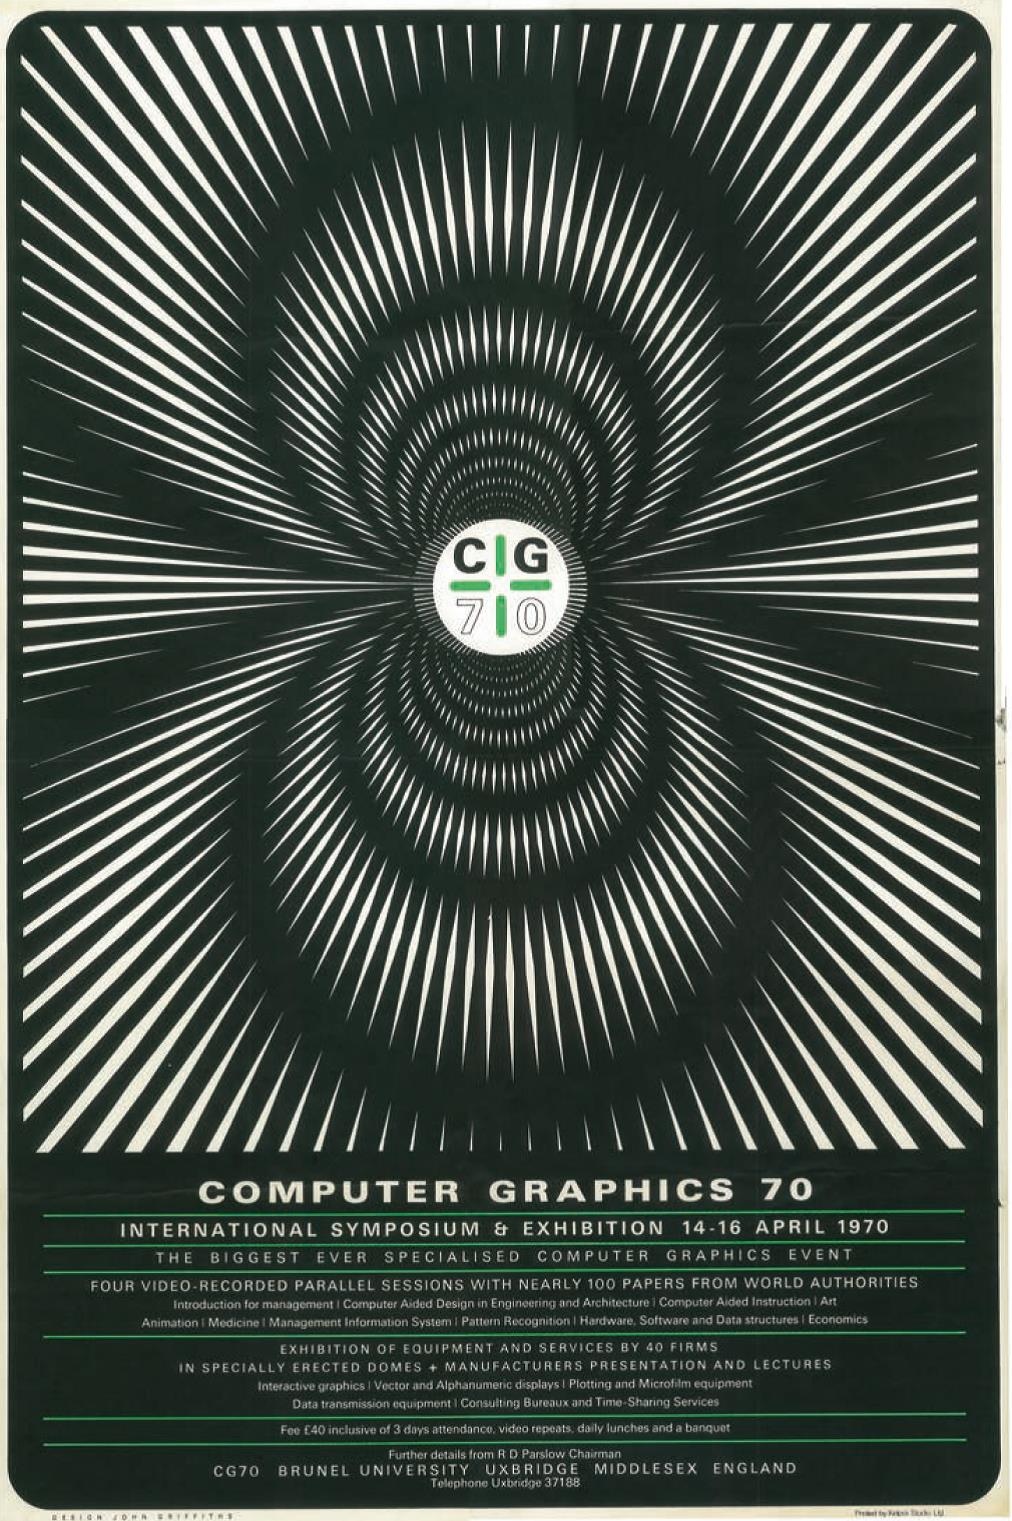 Computer Graphics 70